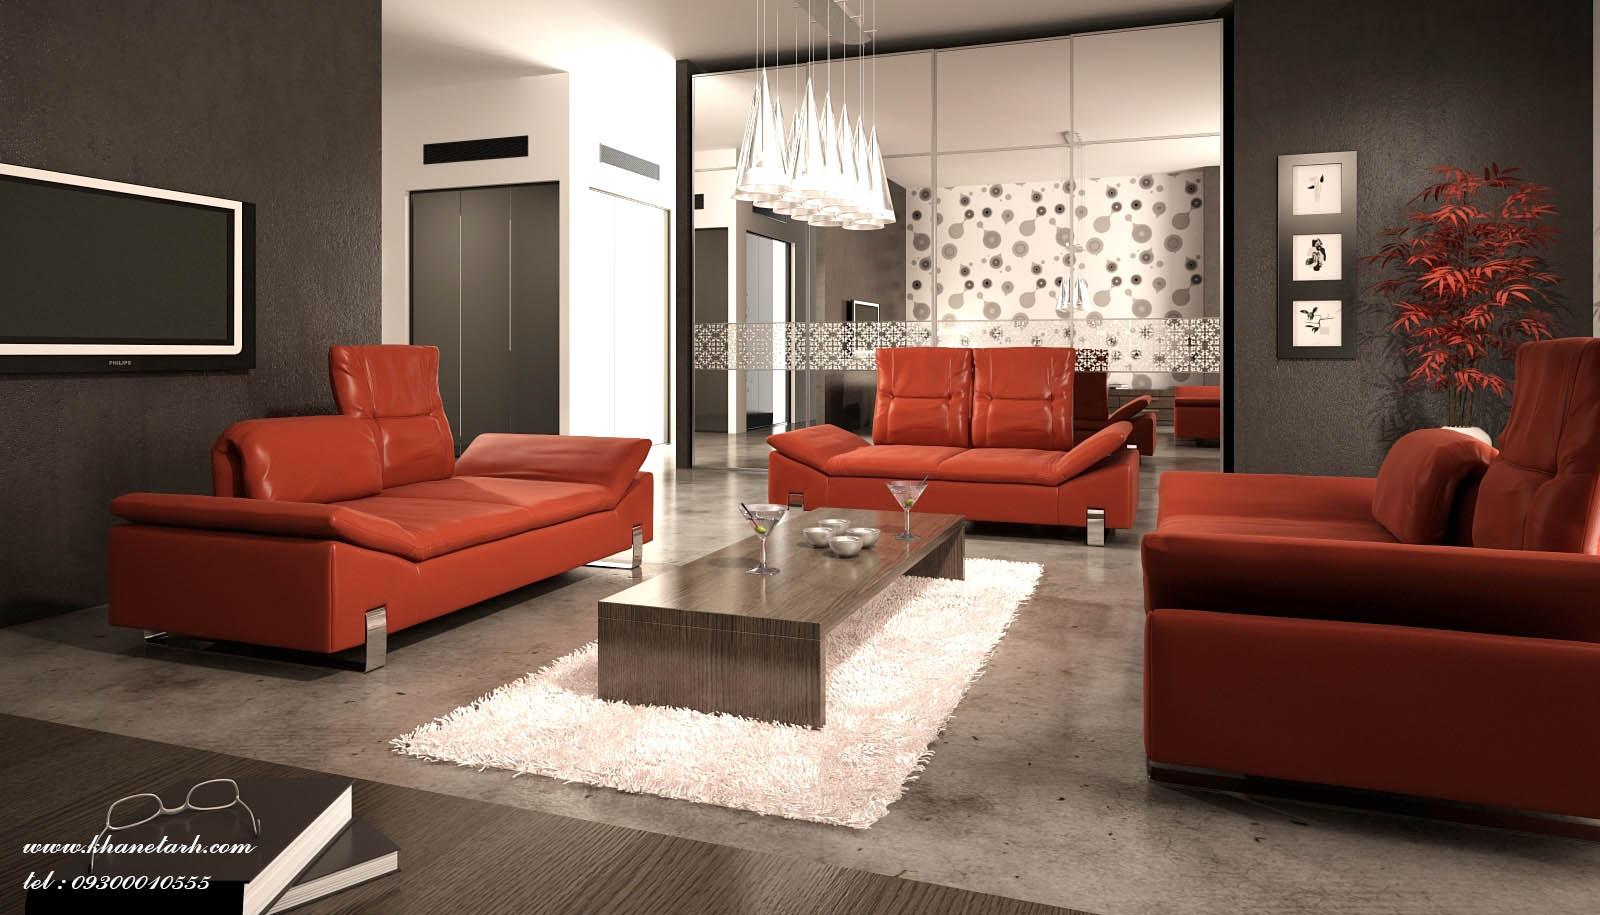 loxblog com. Black Bedroom Furniture Sets. Home Design Ideas